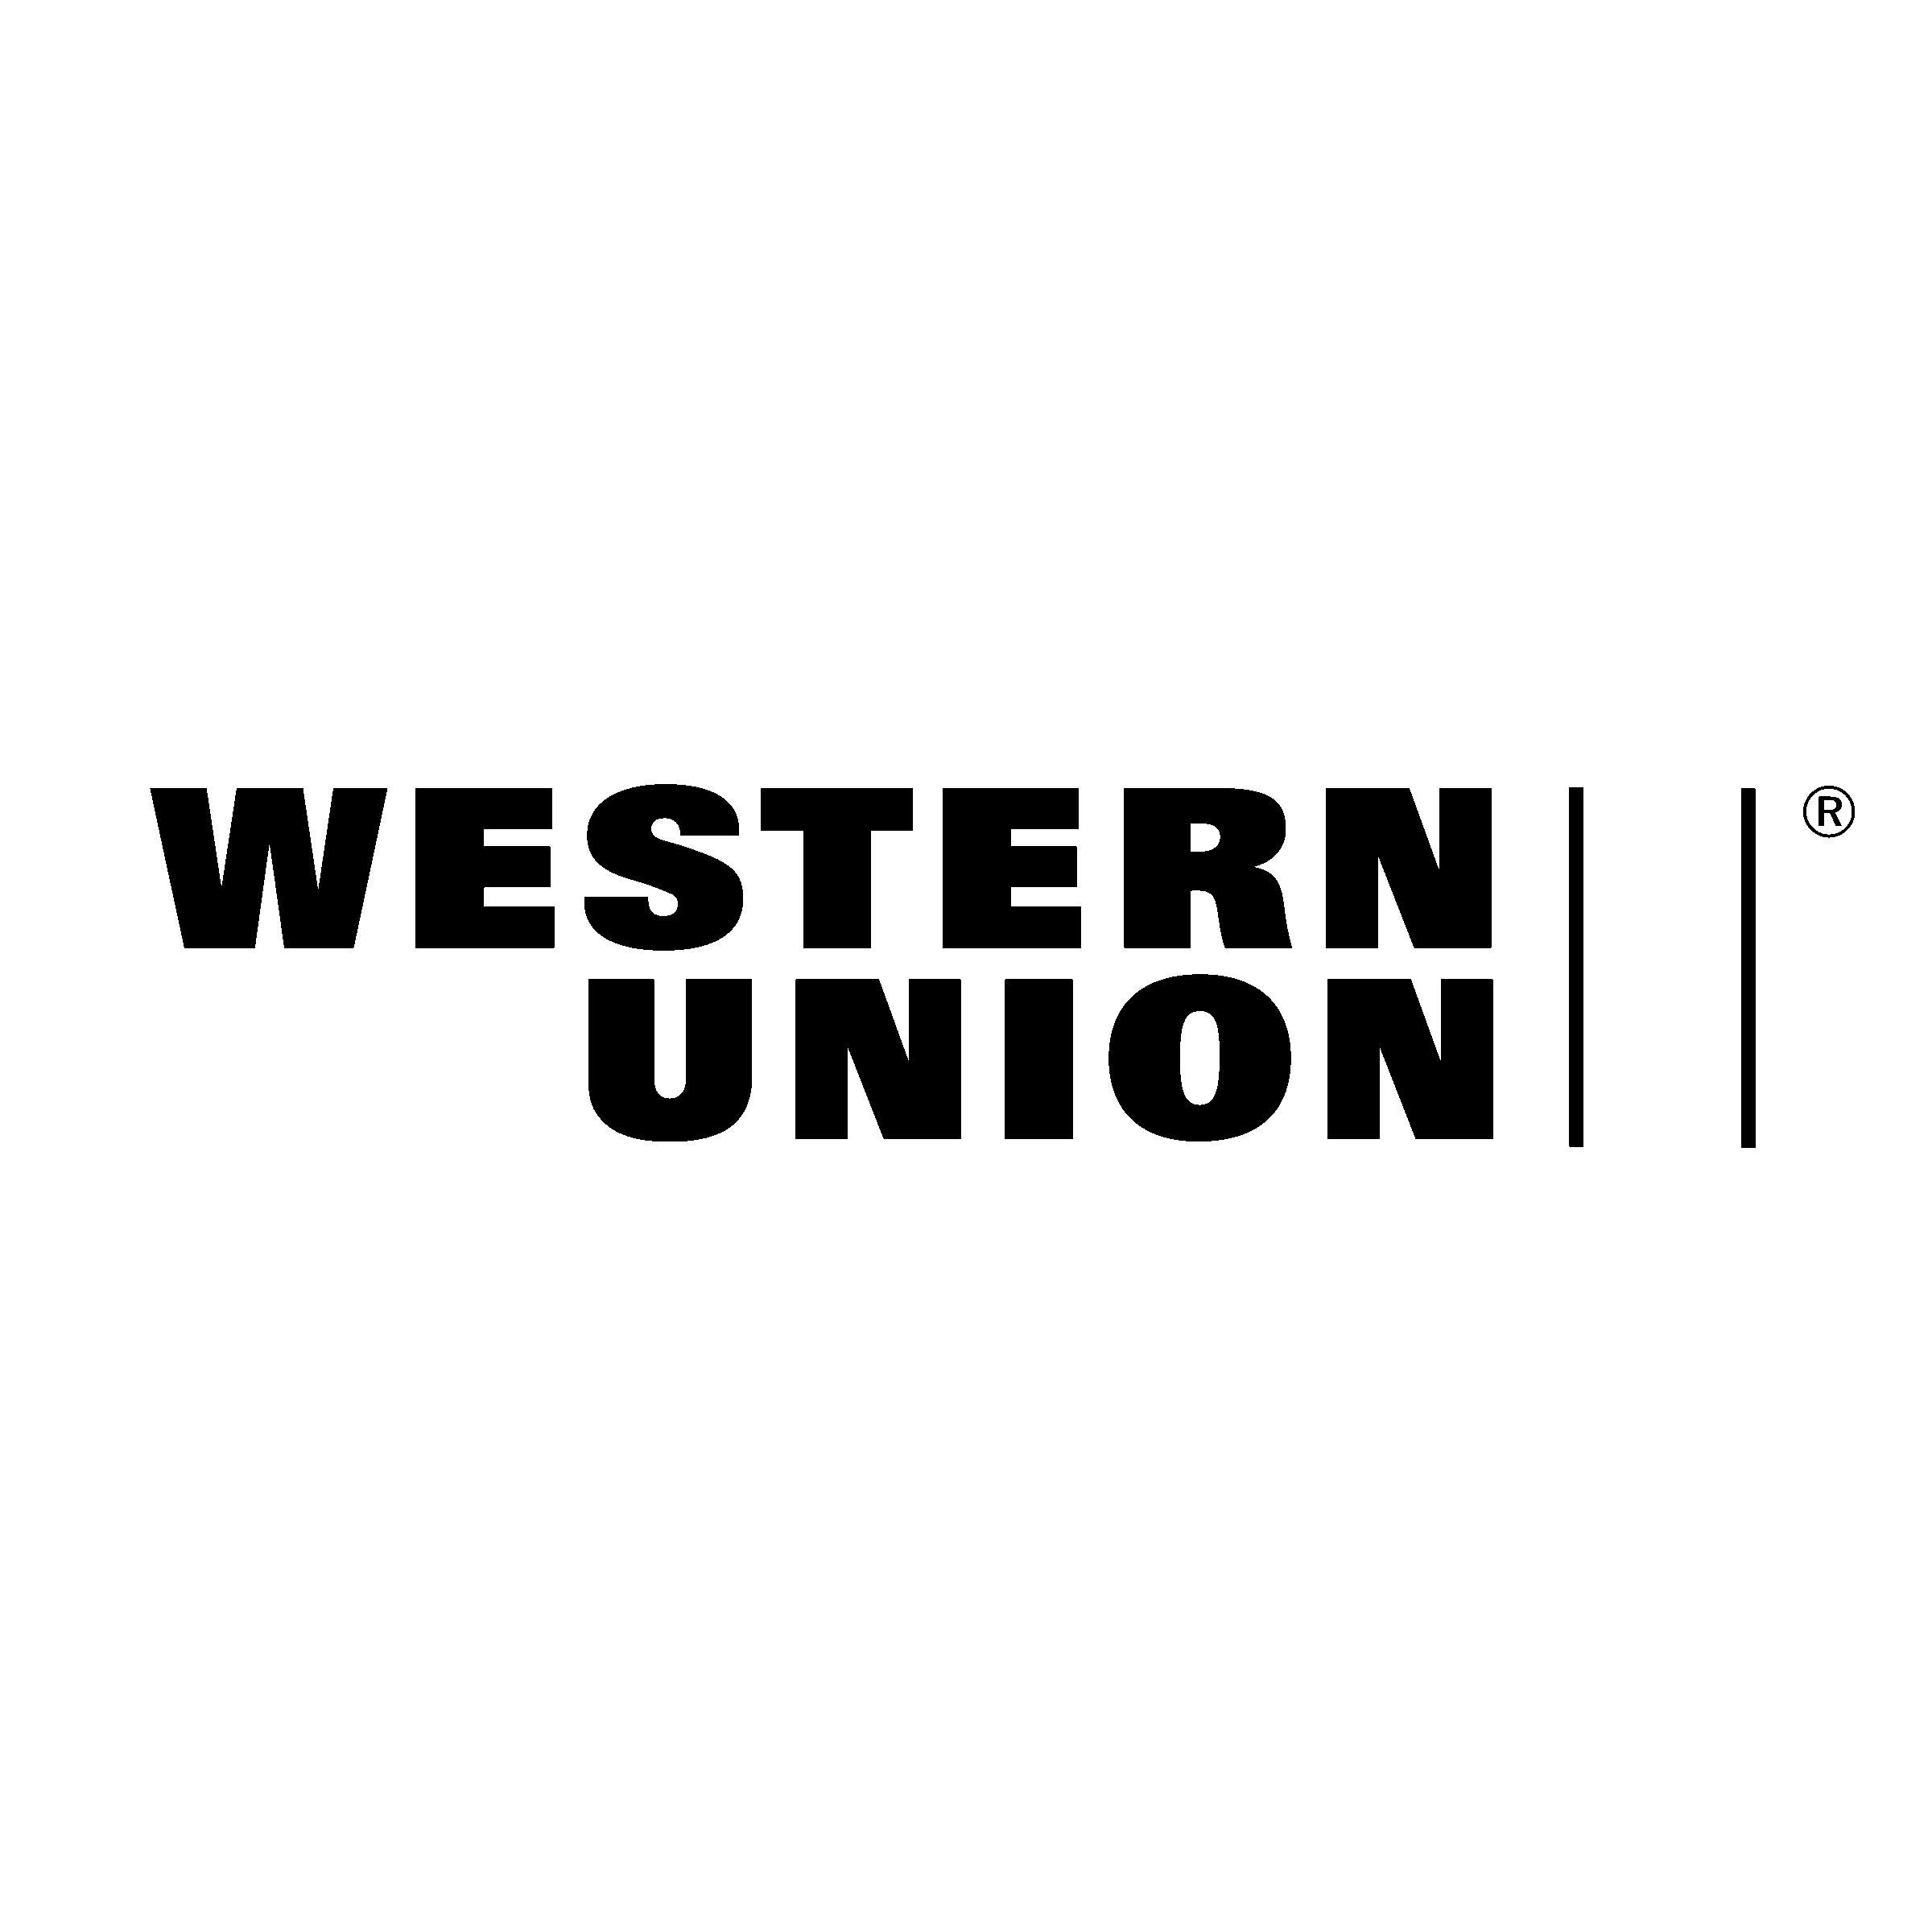 Western union clipart logo